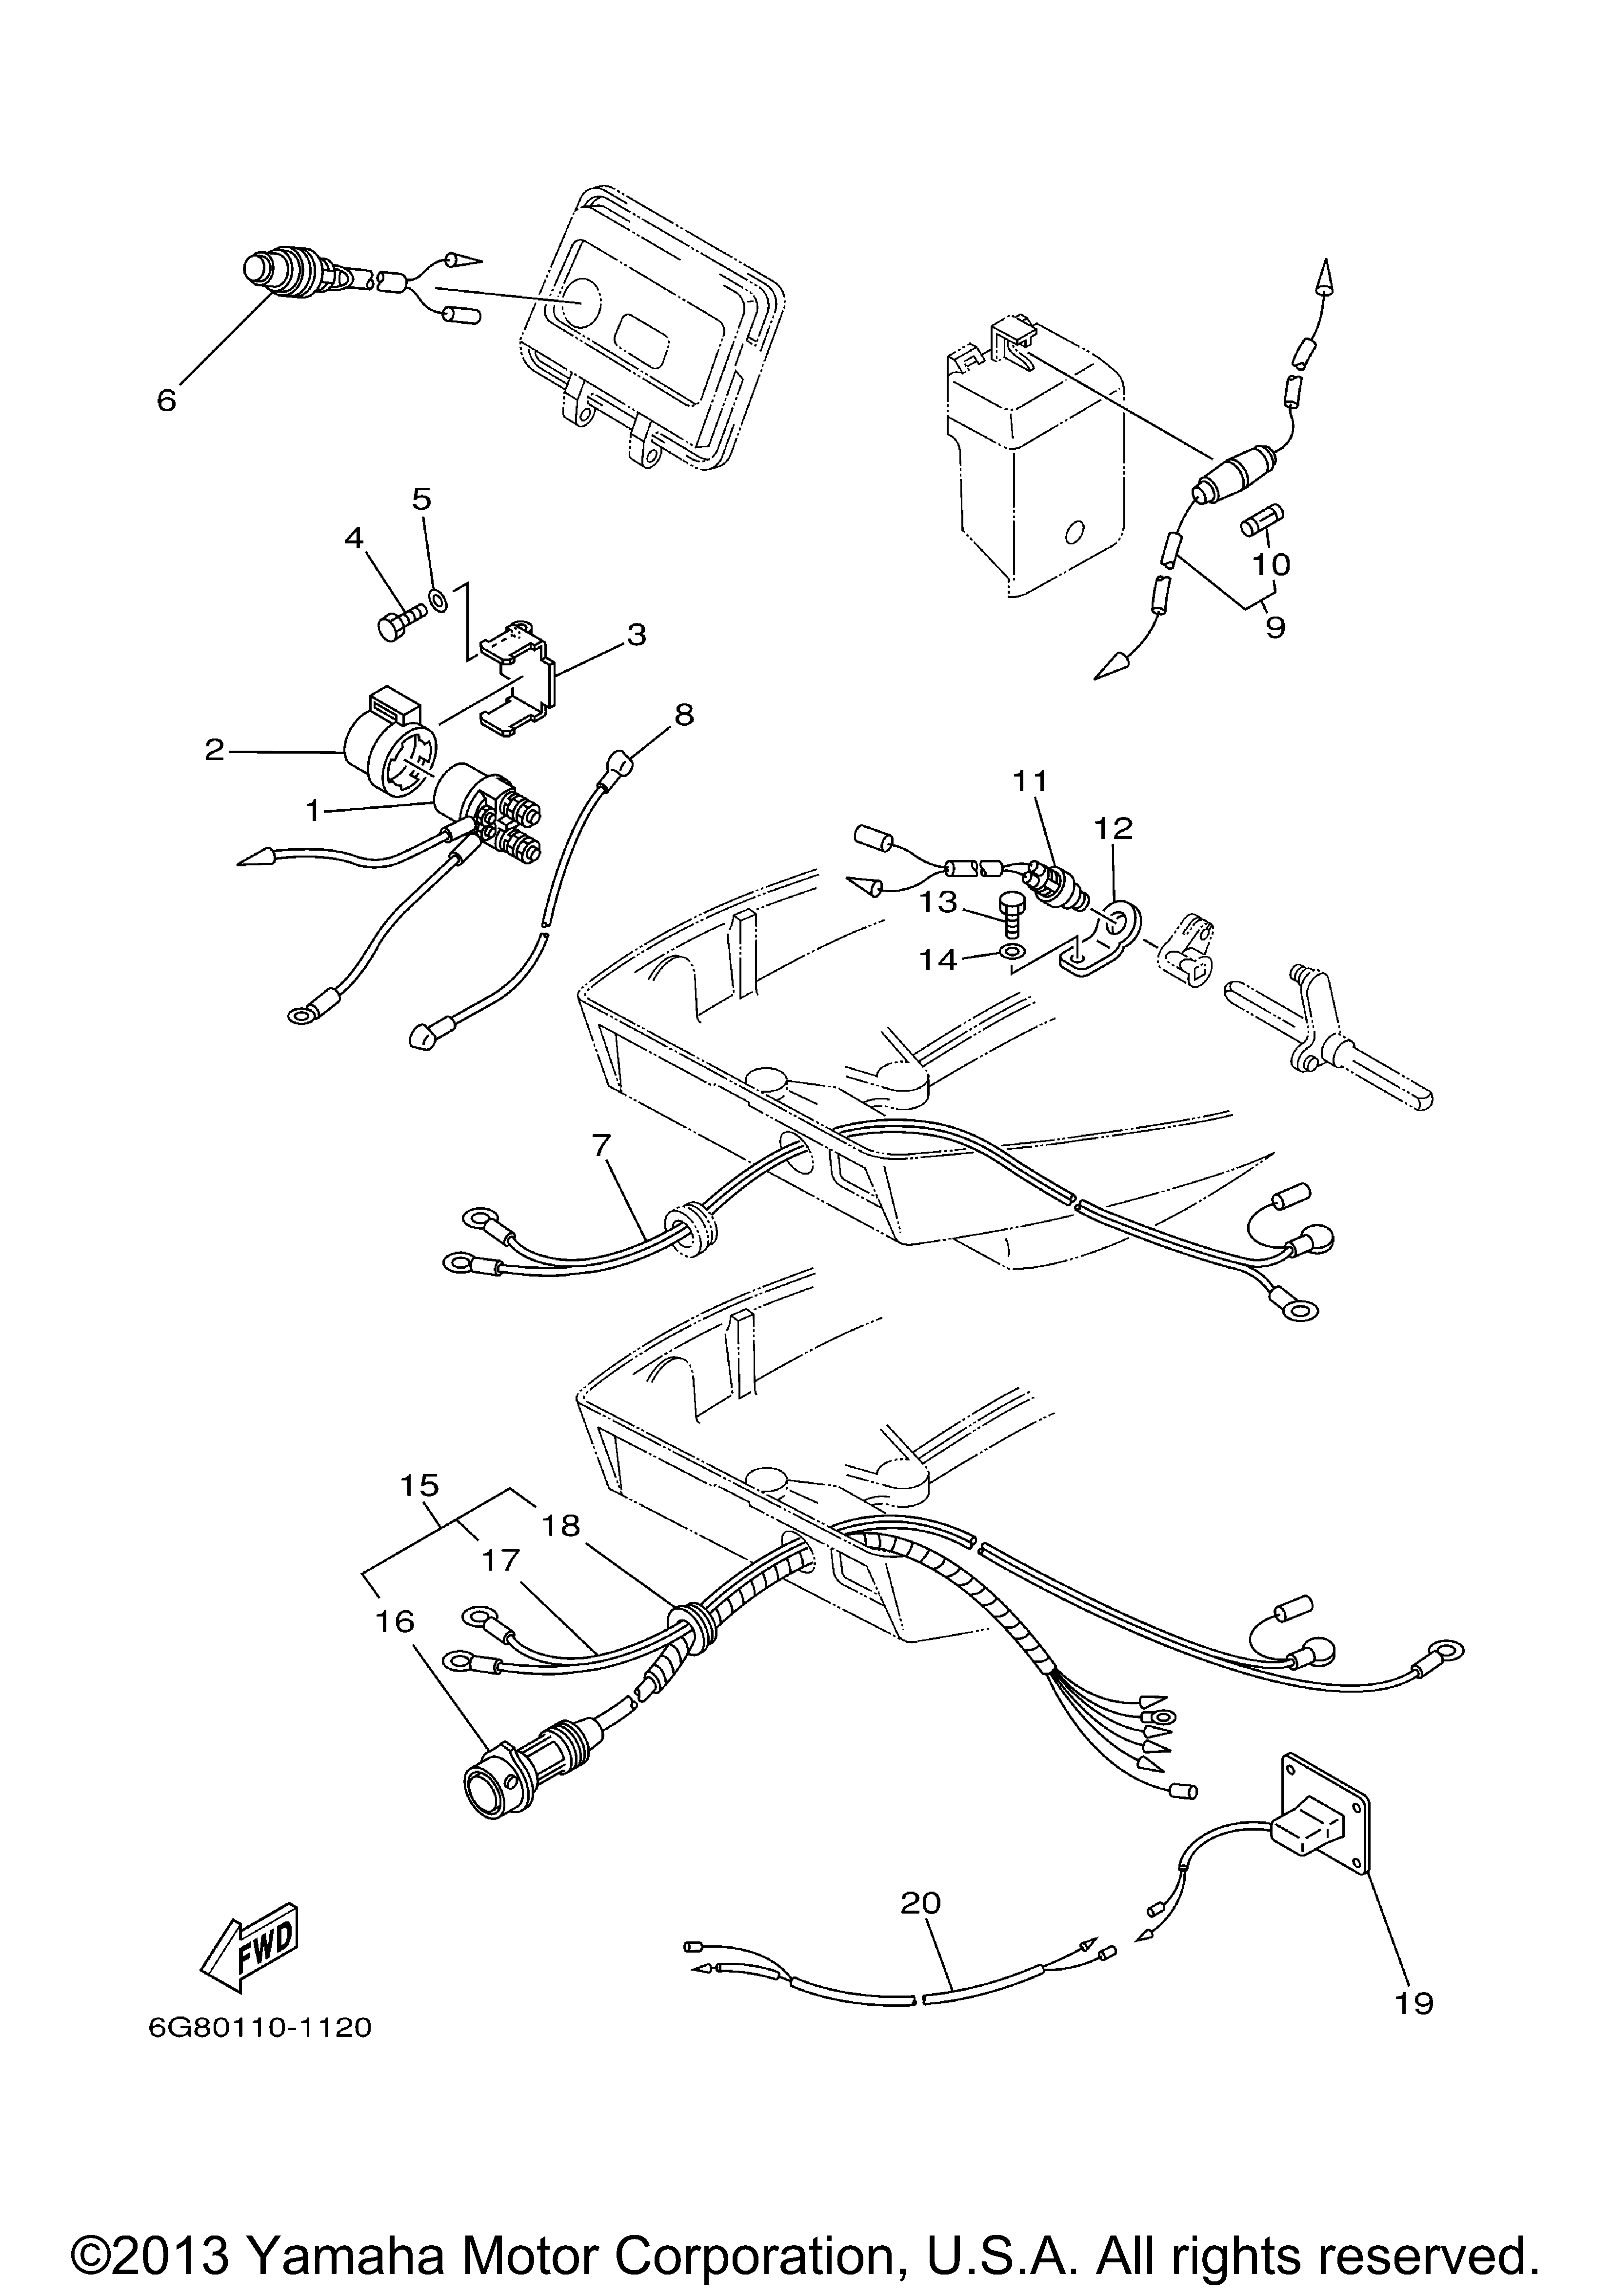 Trolling Motor Parts Diagram Also Trolling Motor Wiring Diagram